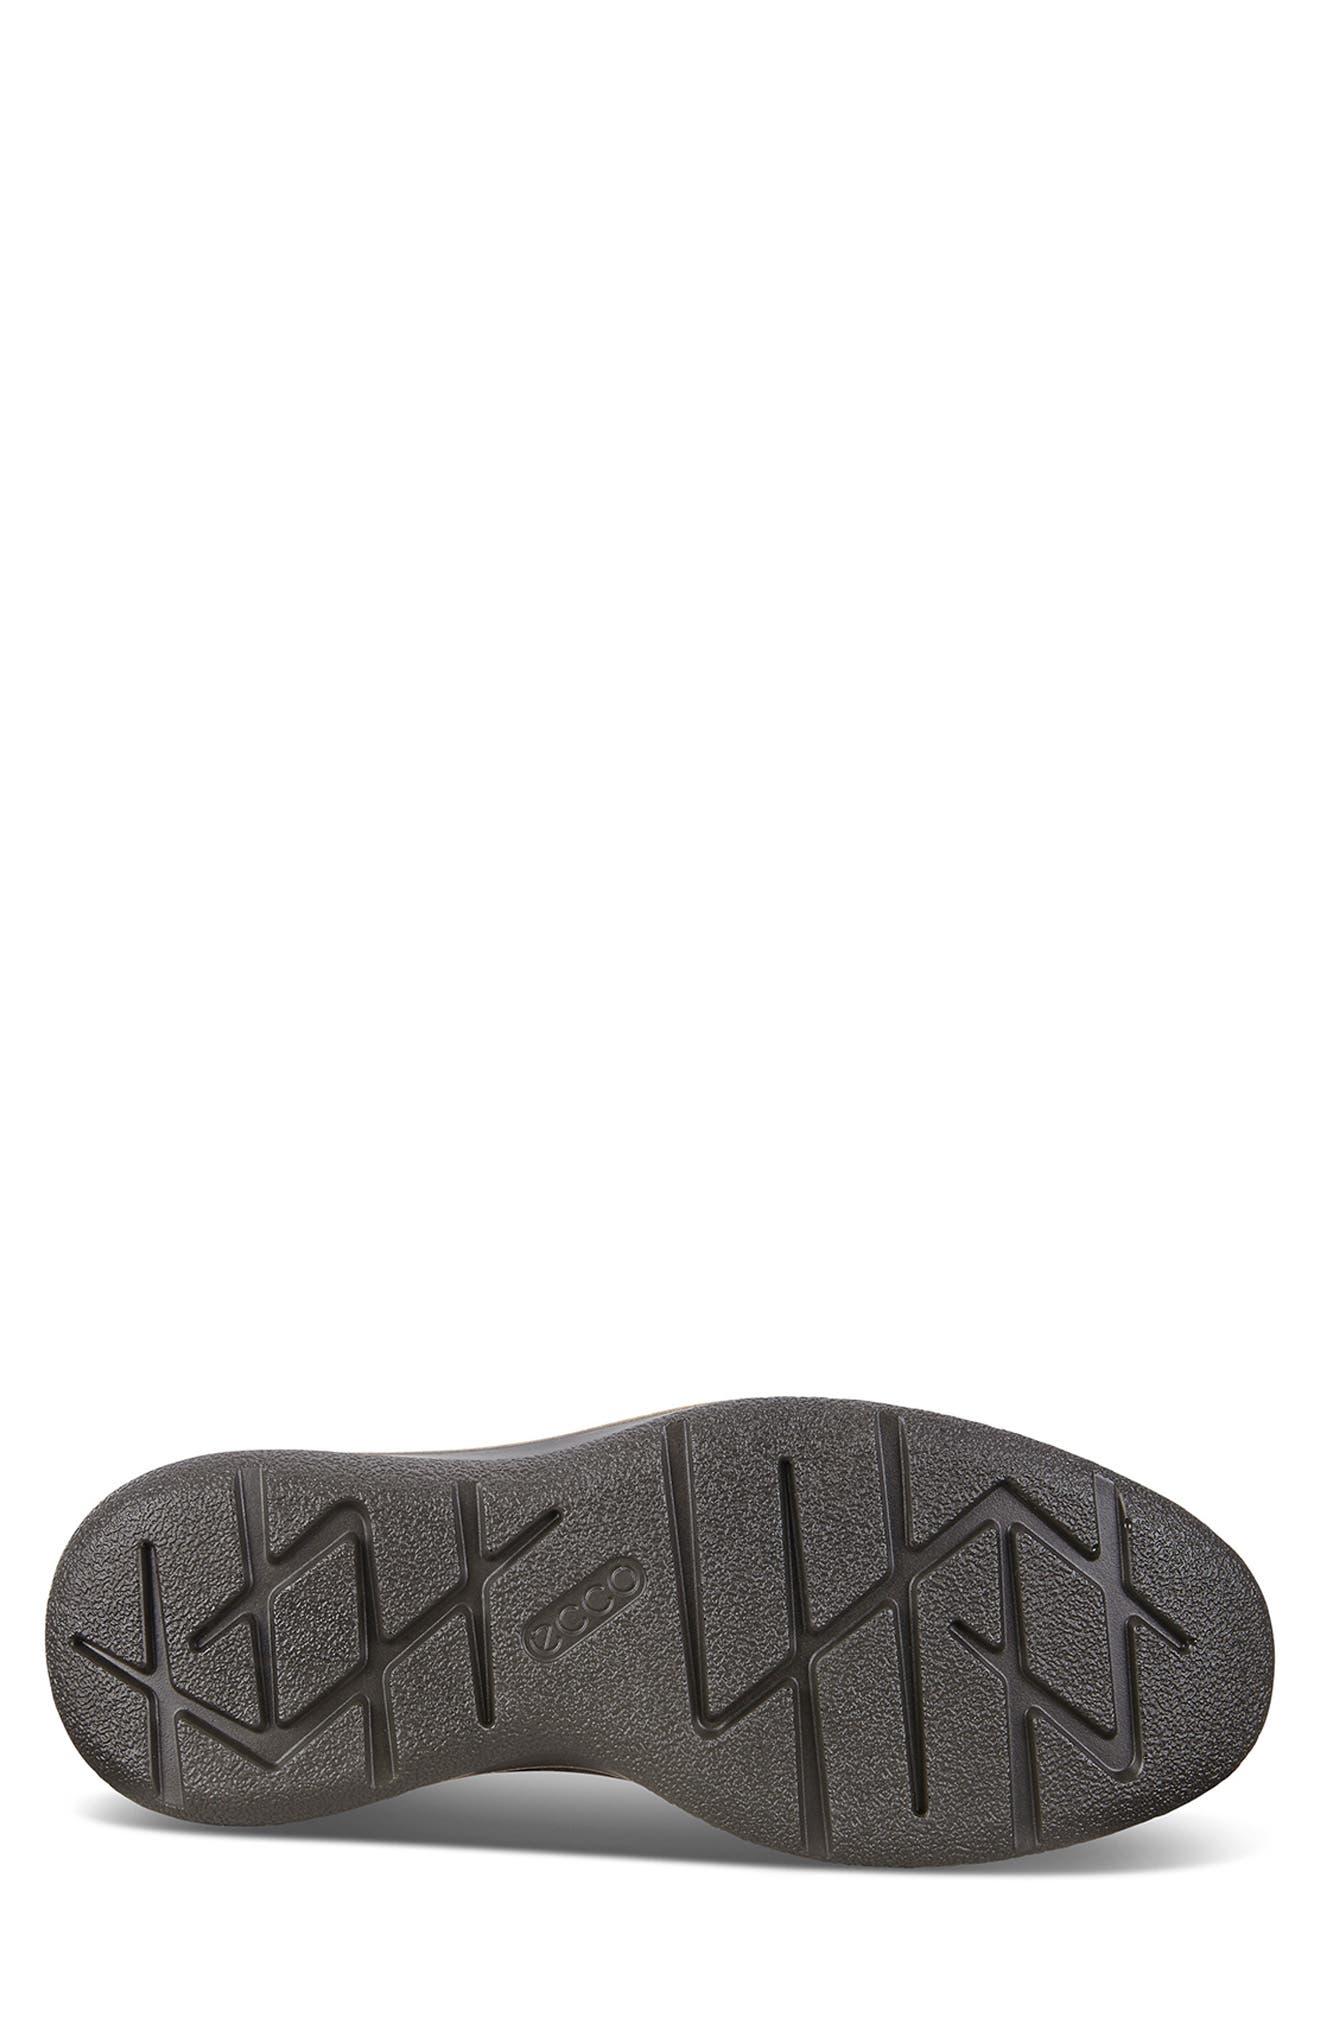 Aurora Plain Toe Boot,                             Alternate thumbnail 3, color,                             COFFEE SUEDE